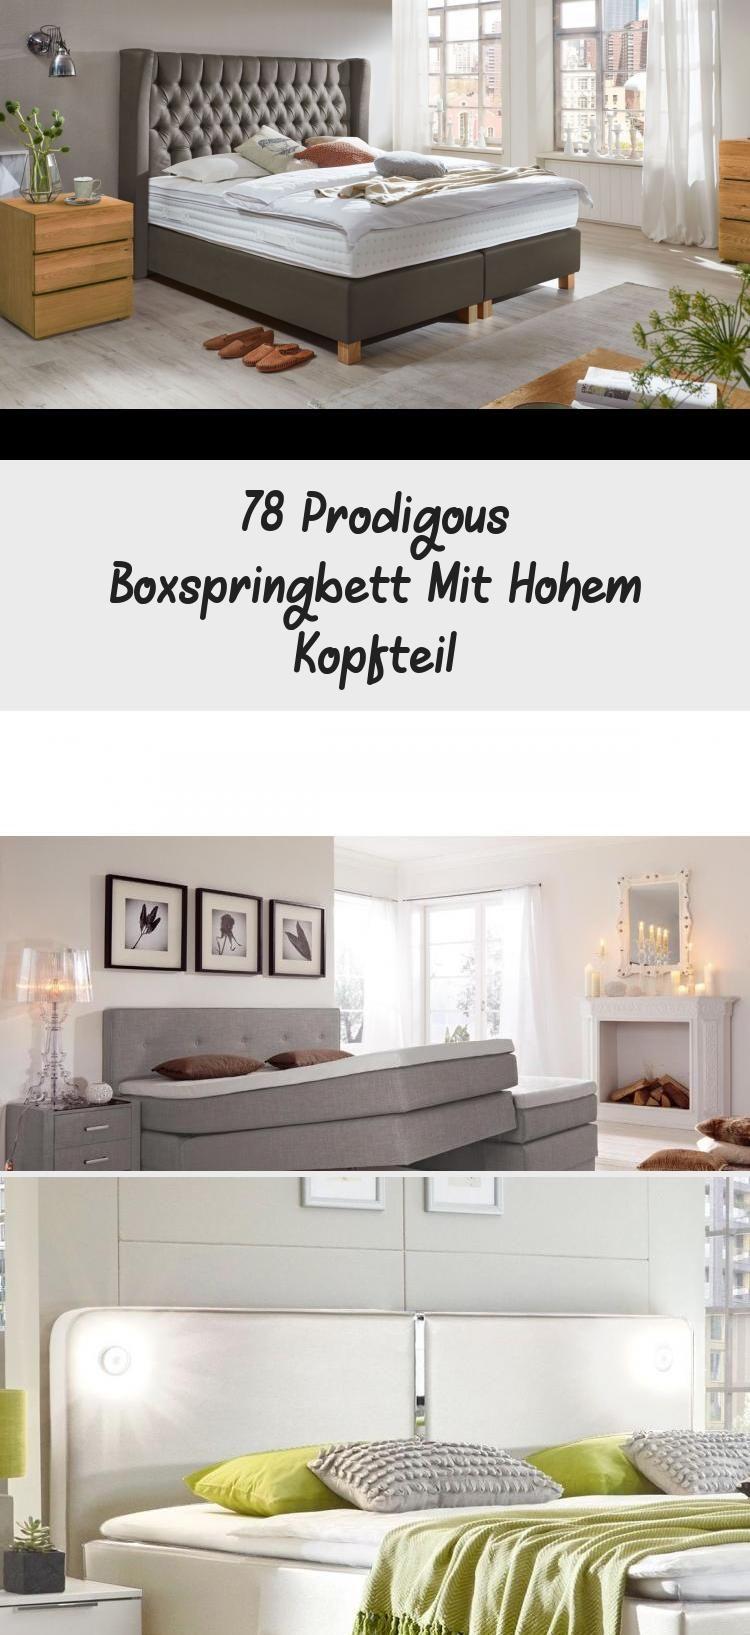 78 Prodigous Boxspringbett Mit Hohem Kopfteil In 2020 With Images Home Home Decor Decor